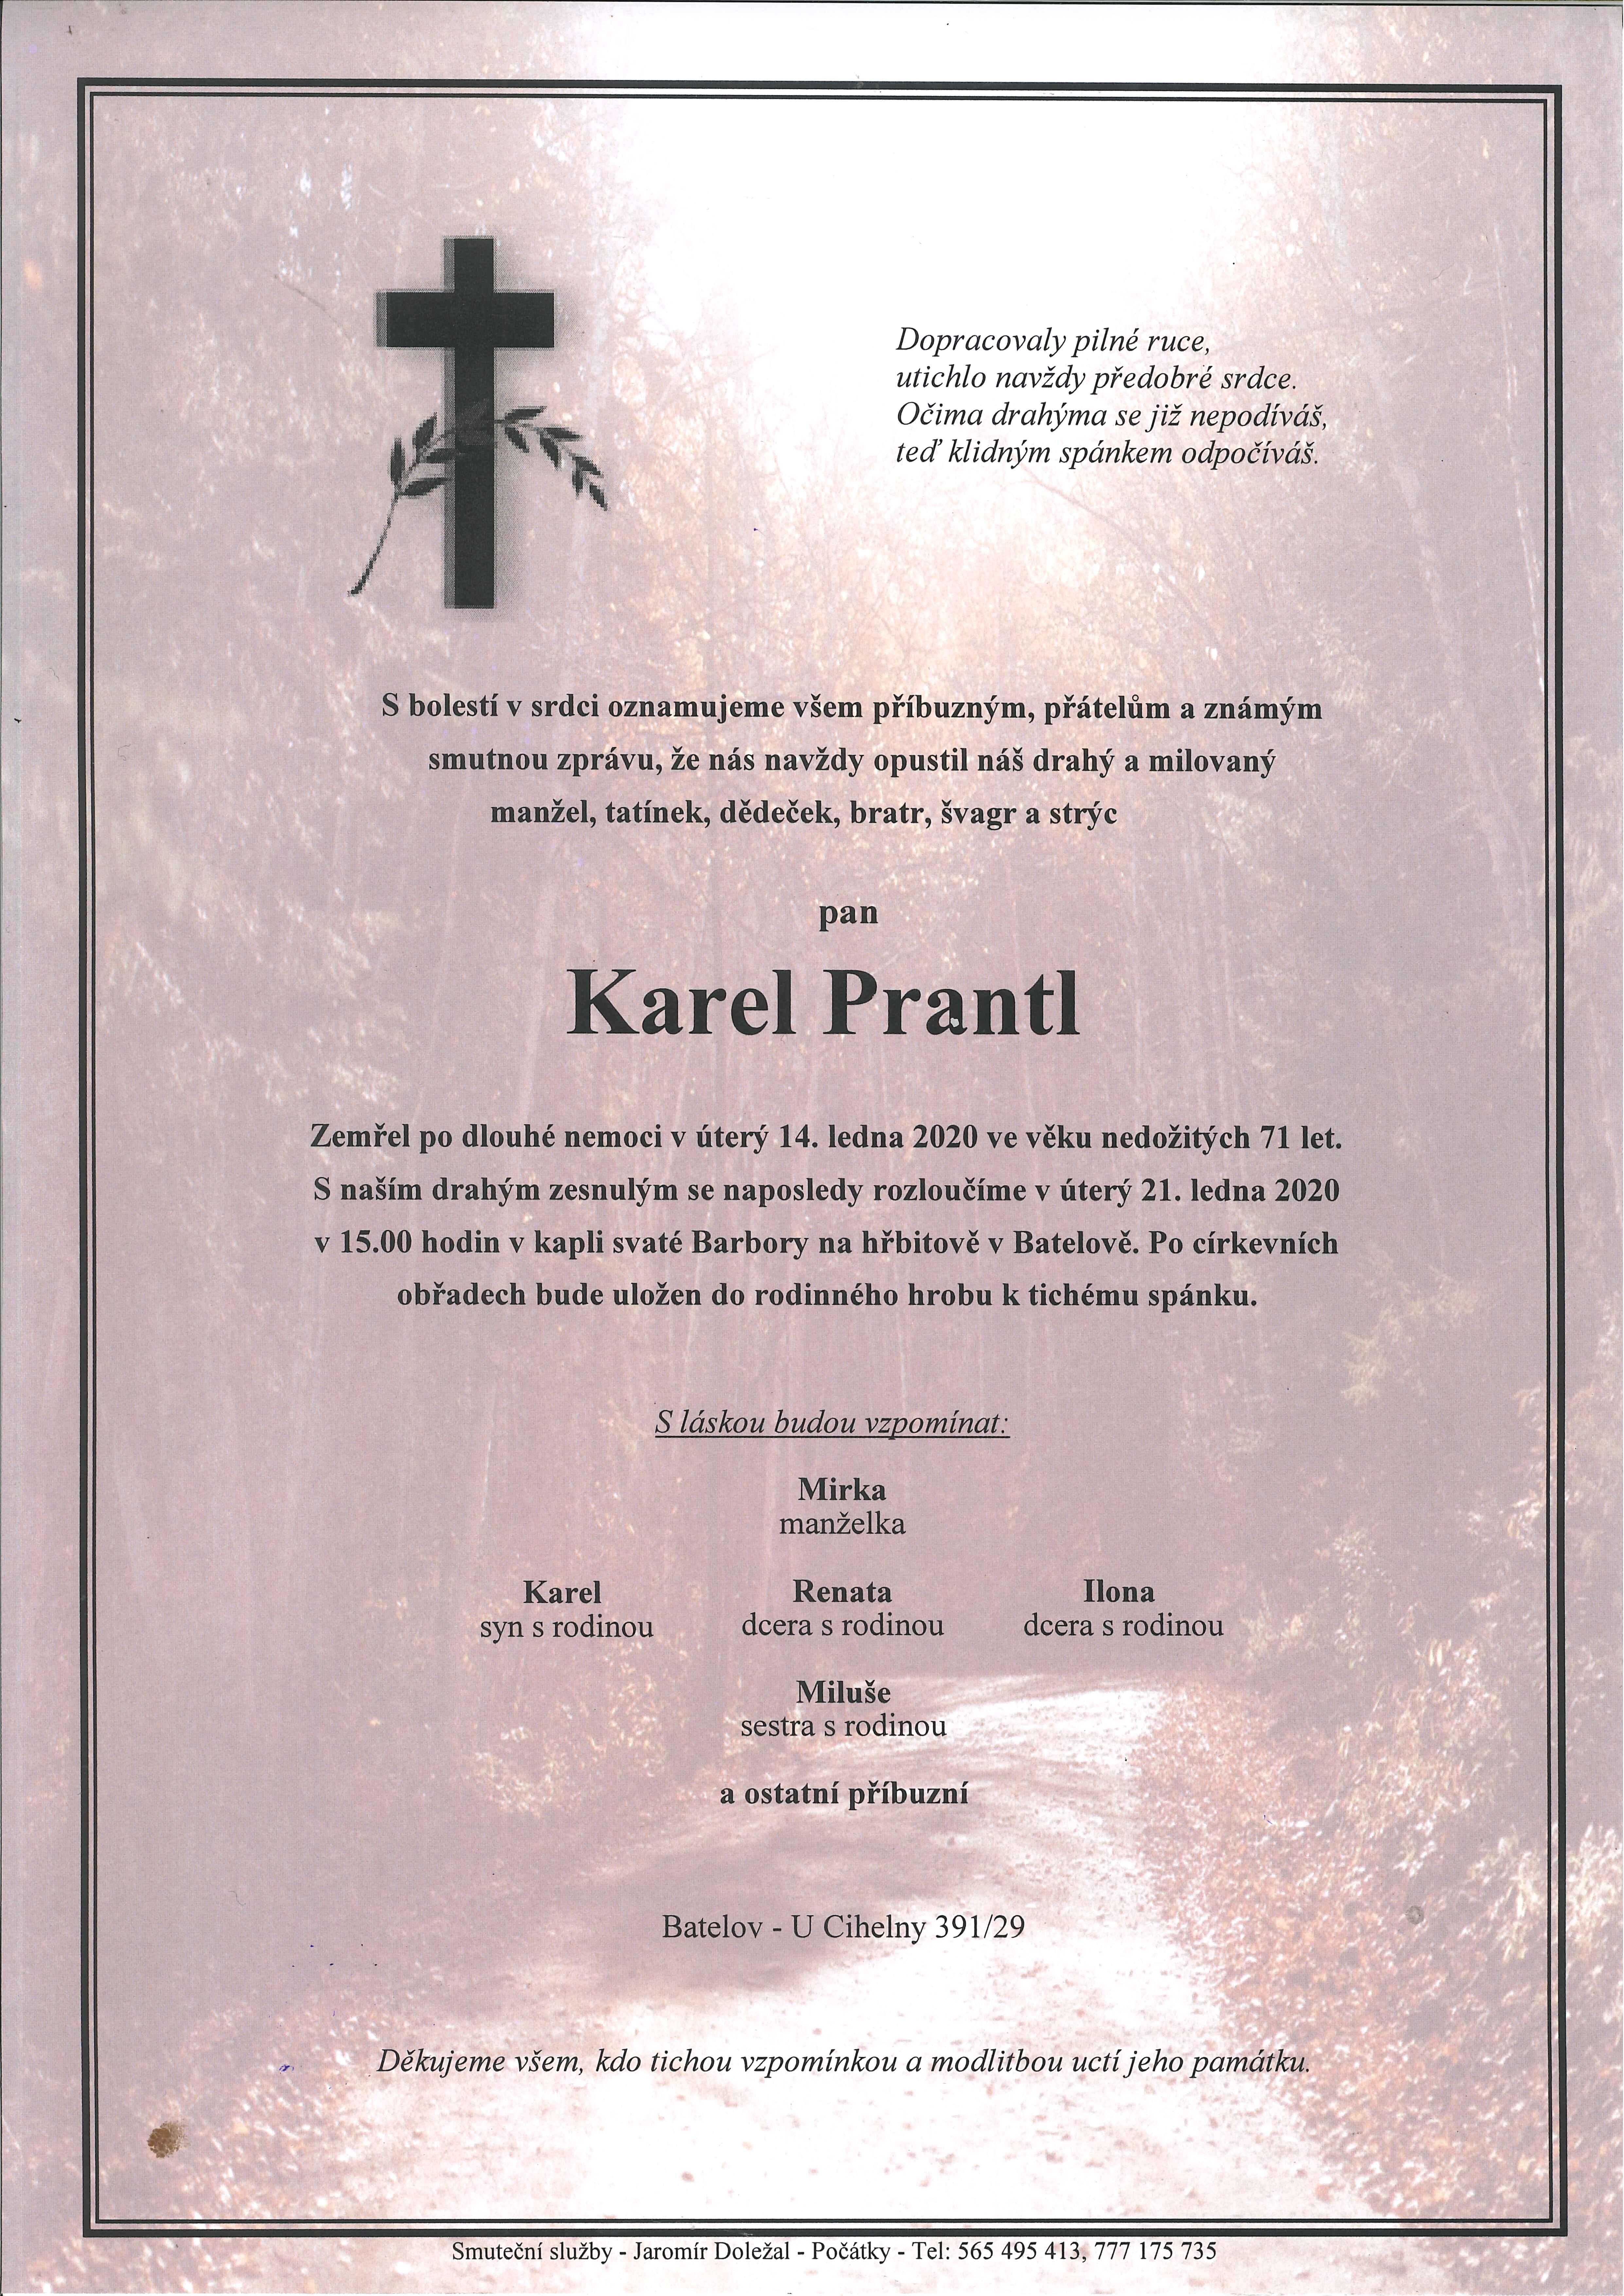 Karel Prantl